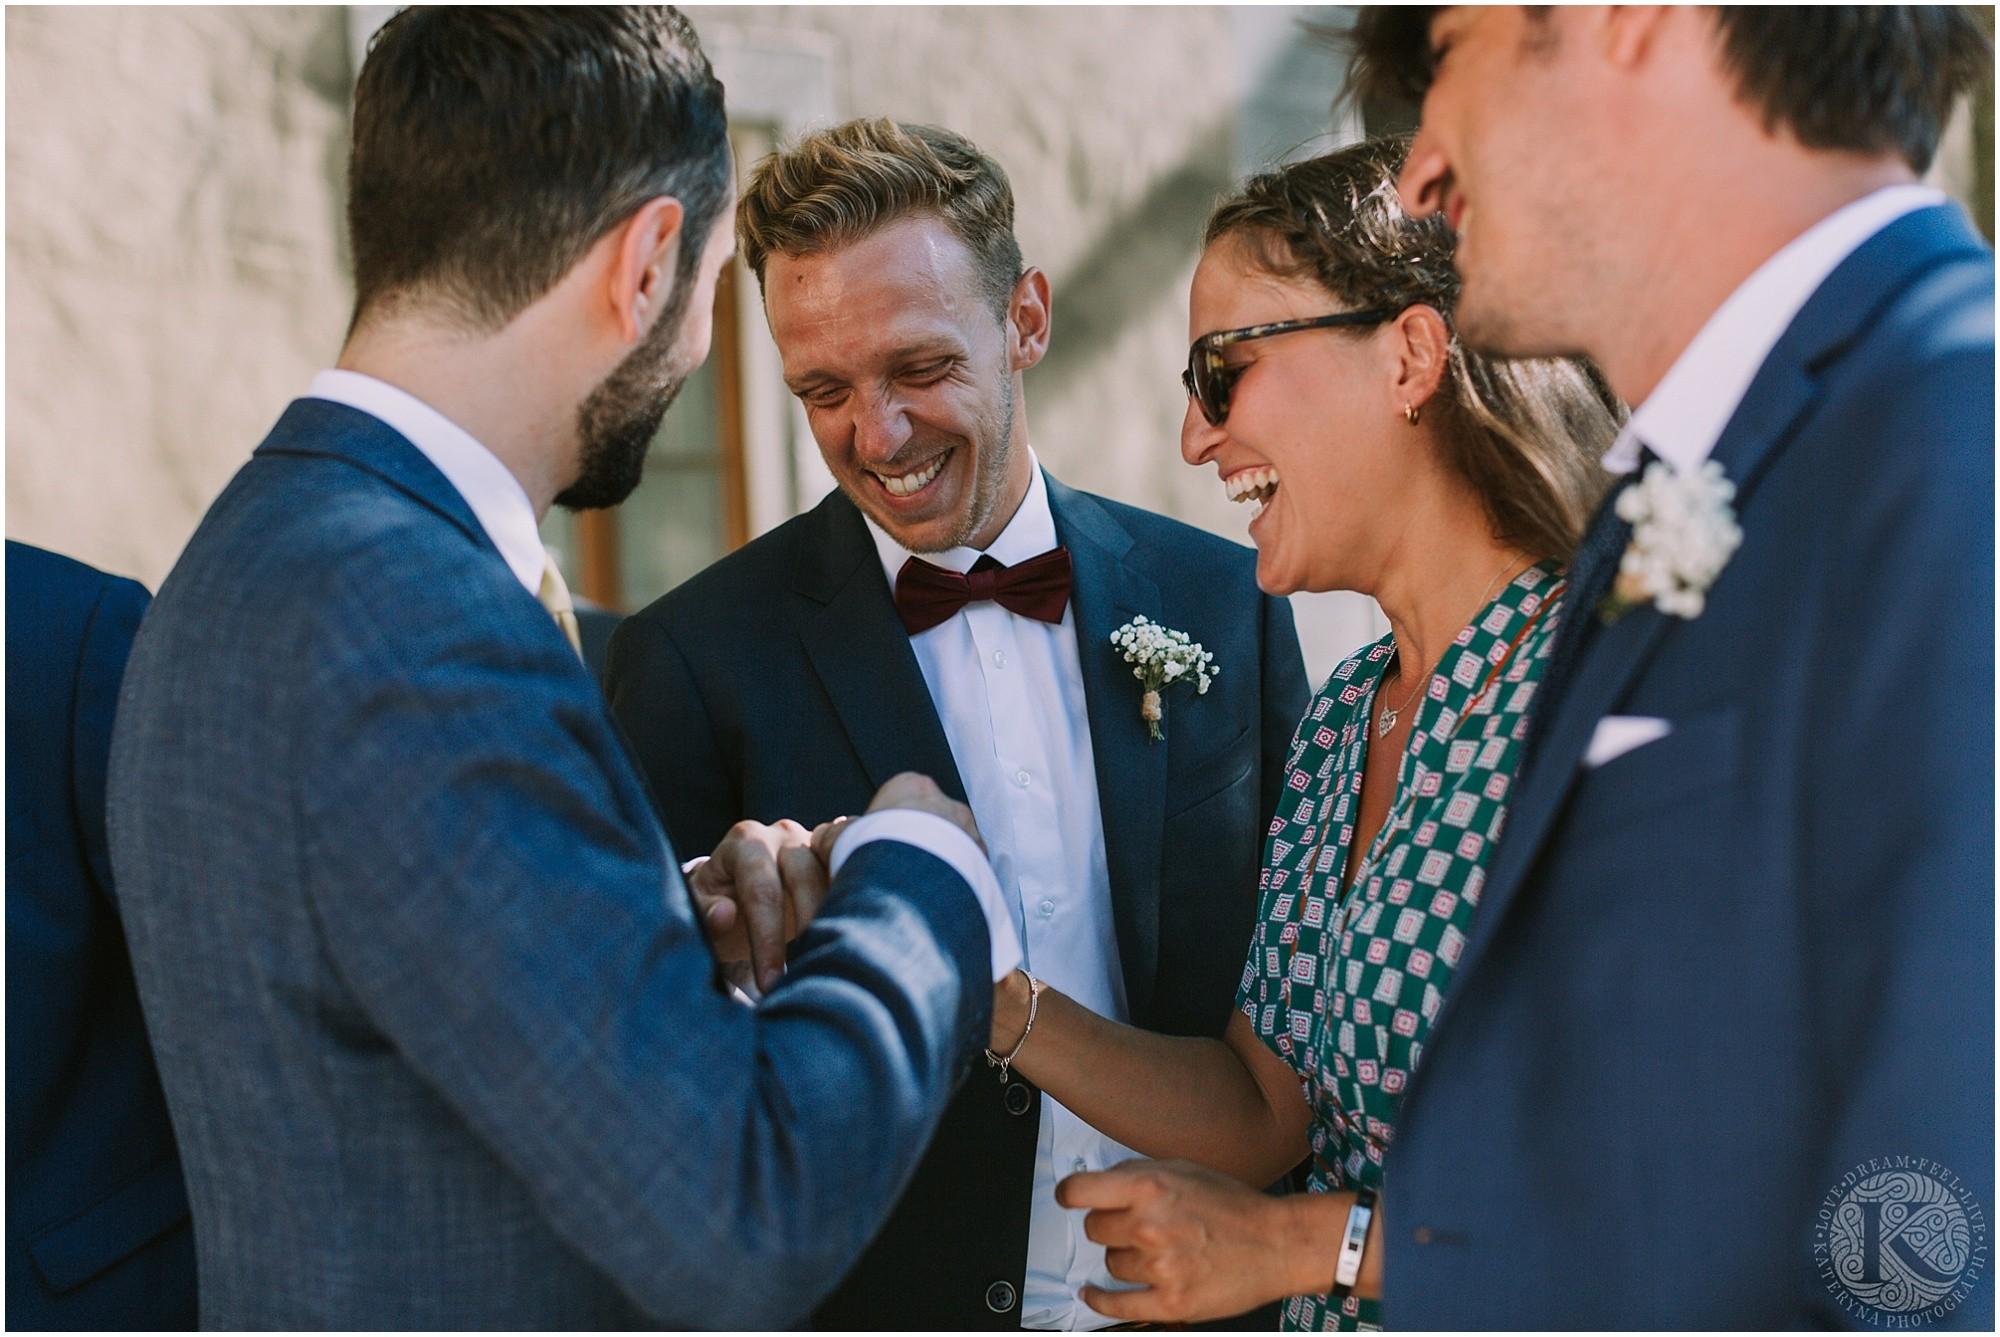 Kateryna-photos-photographe-mariage-vaucluse-provence-avignon-ferme-st-hugues_0038.jpg